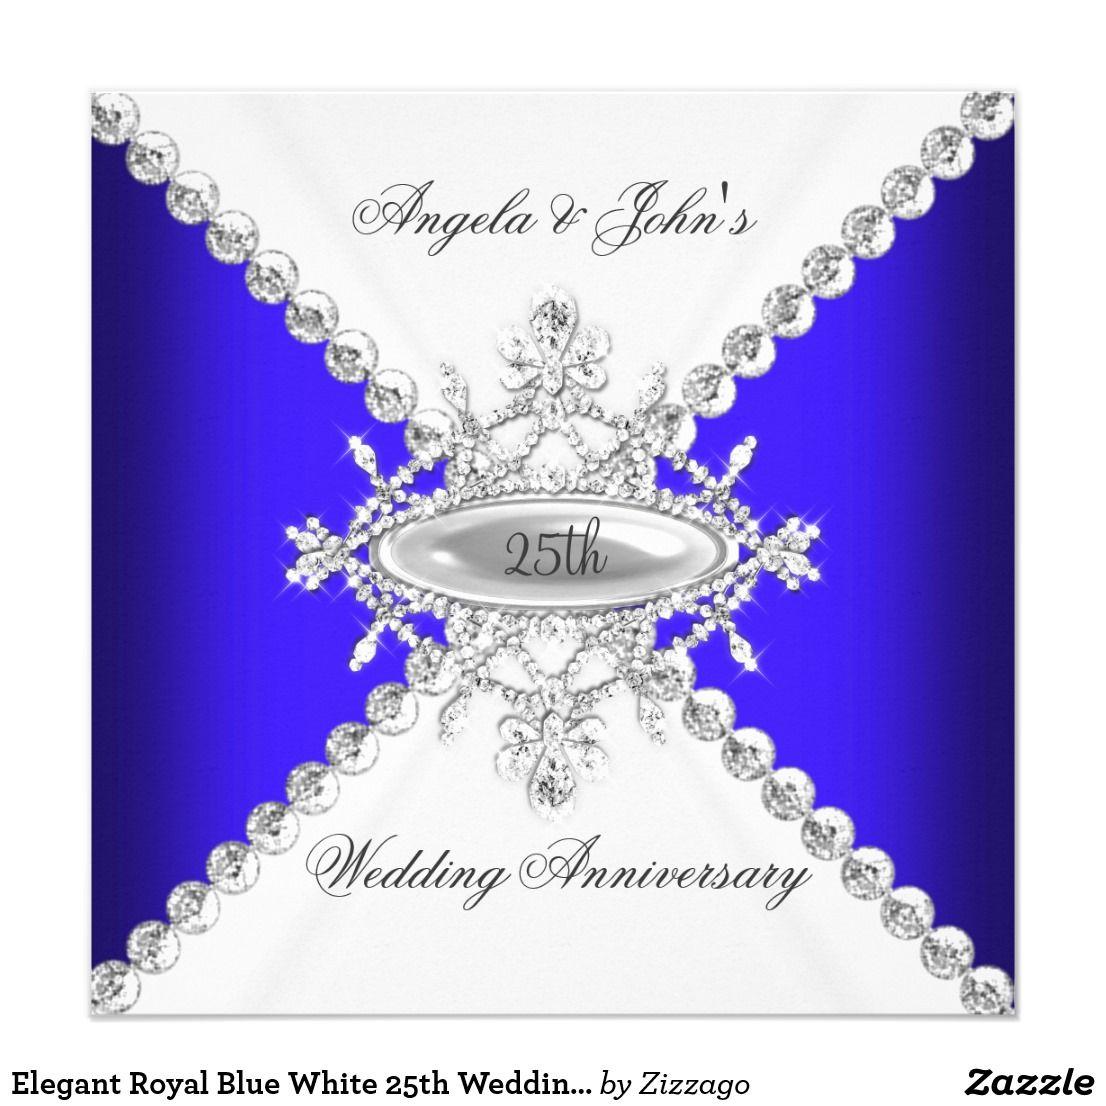 Elegant Royal Blue White 25th Wedding Anniversary Invitation ...